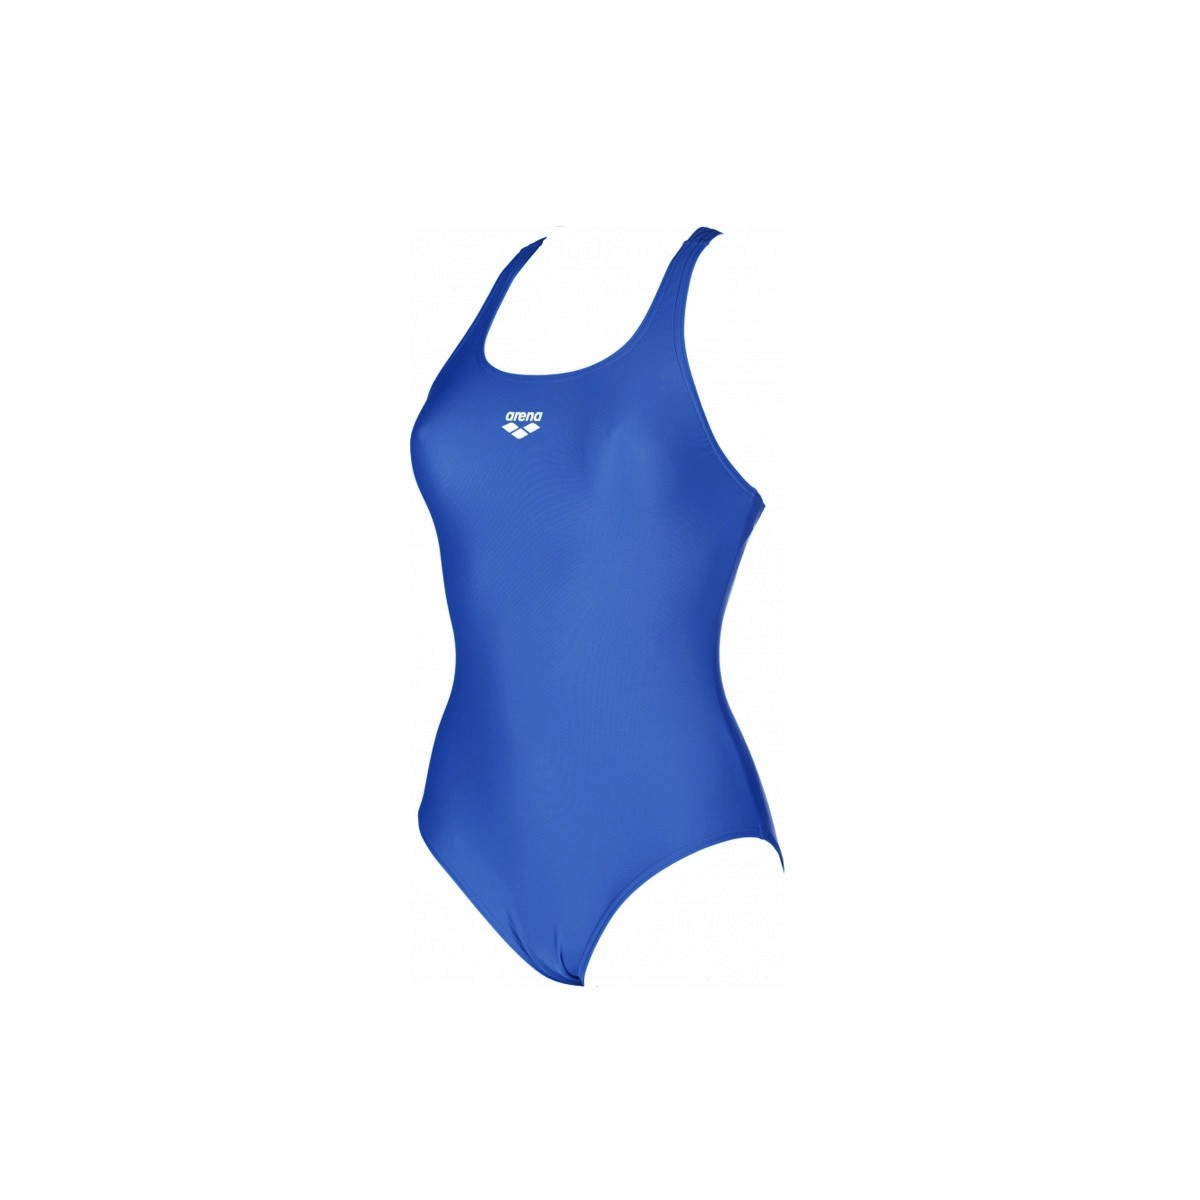 Maillot de bain arena dynamo femme maillot de bain mer for Serviette piscine arena